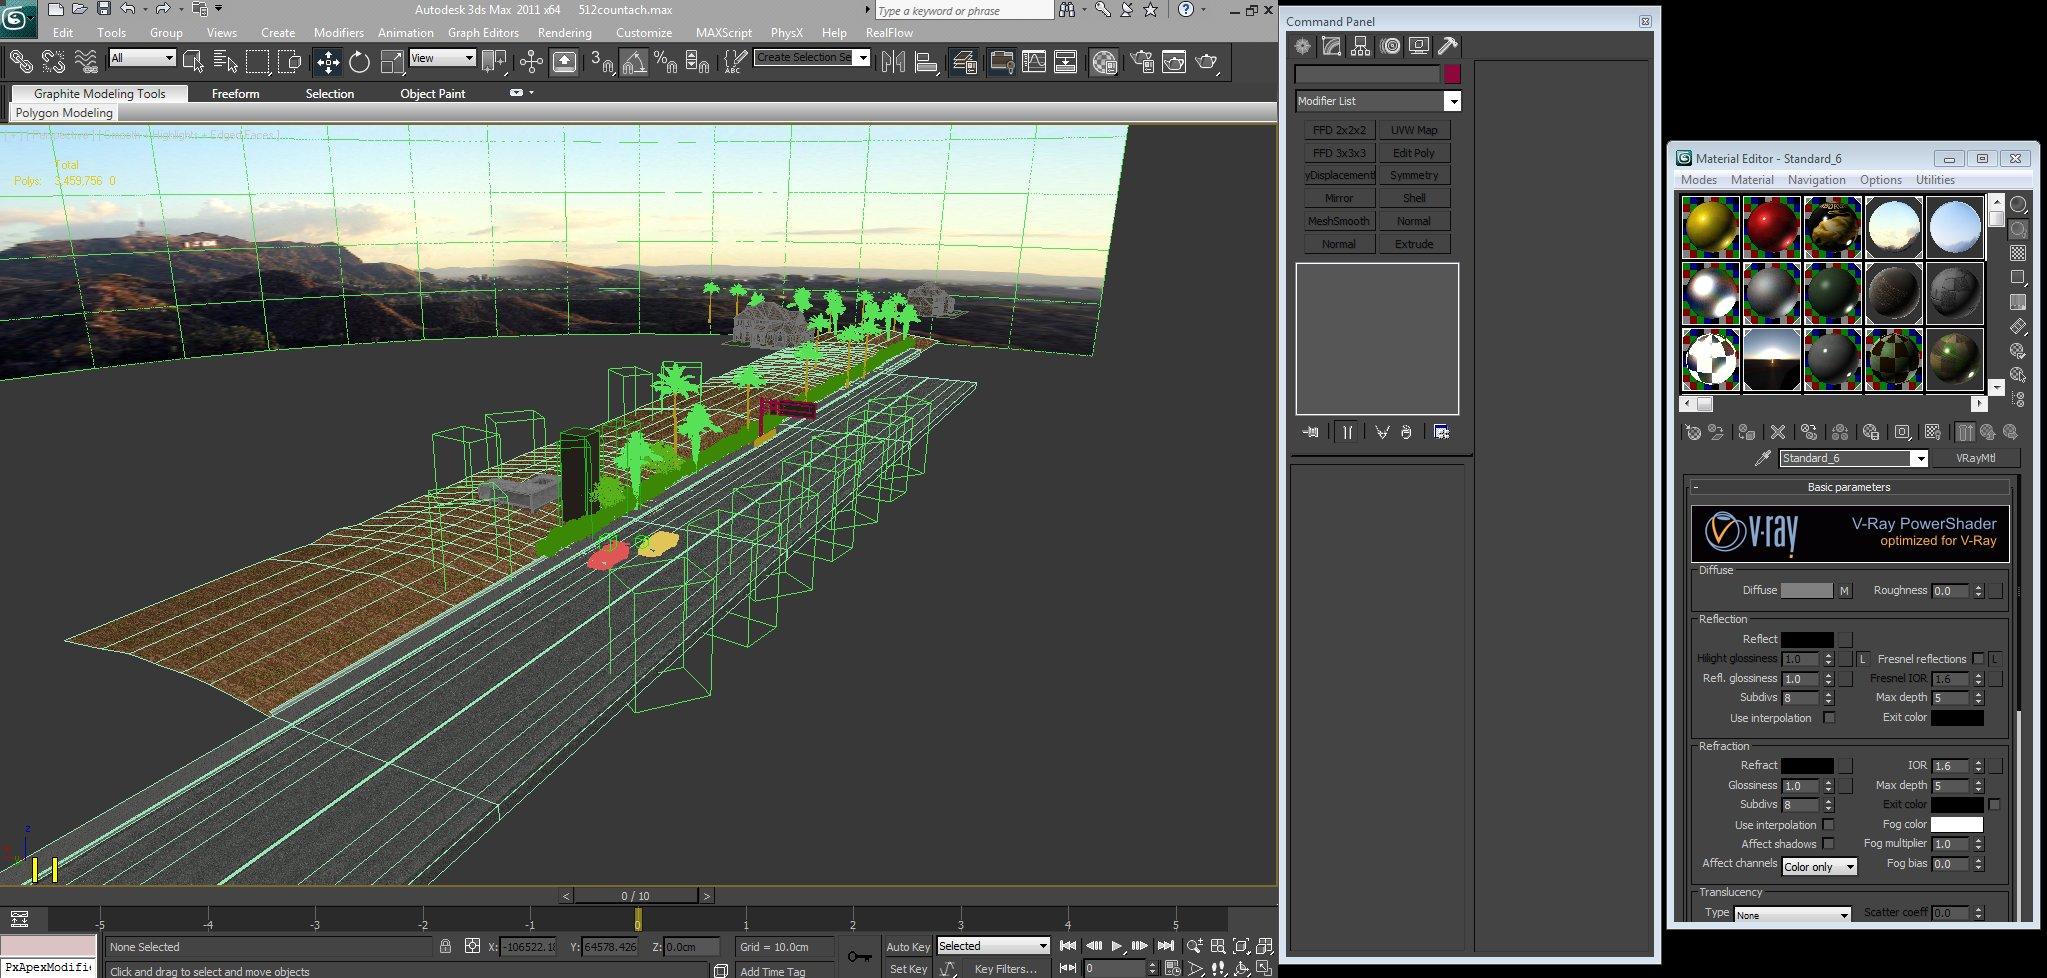 screenshot of the workspace